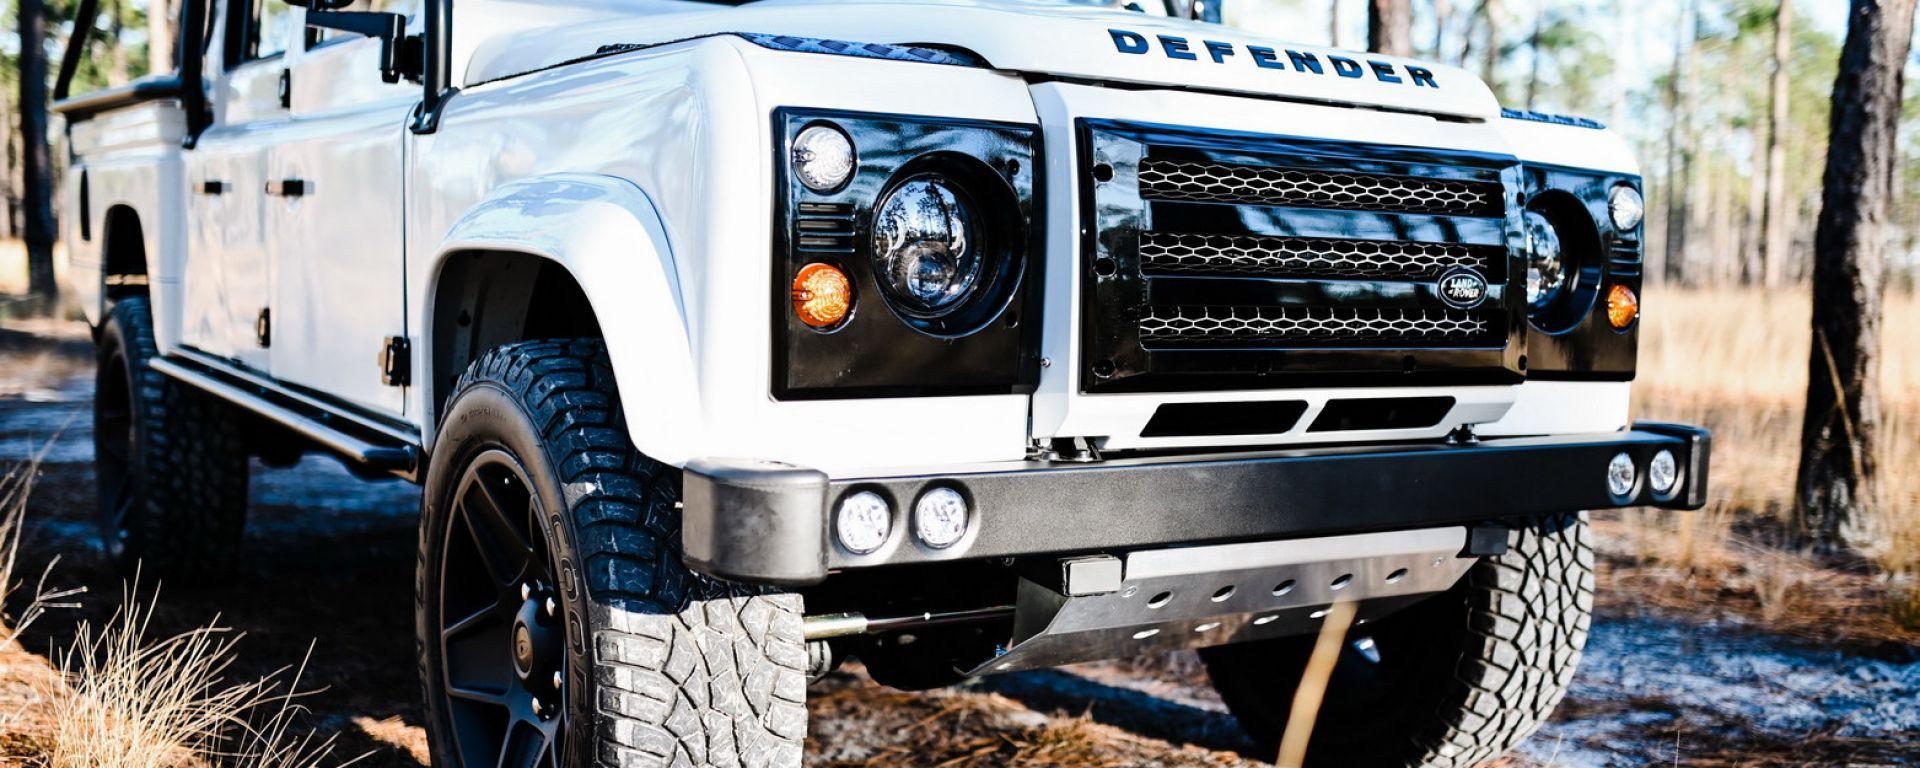 Land Rover Defender 130 Restomod